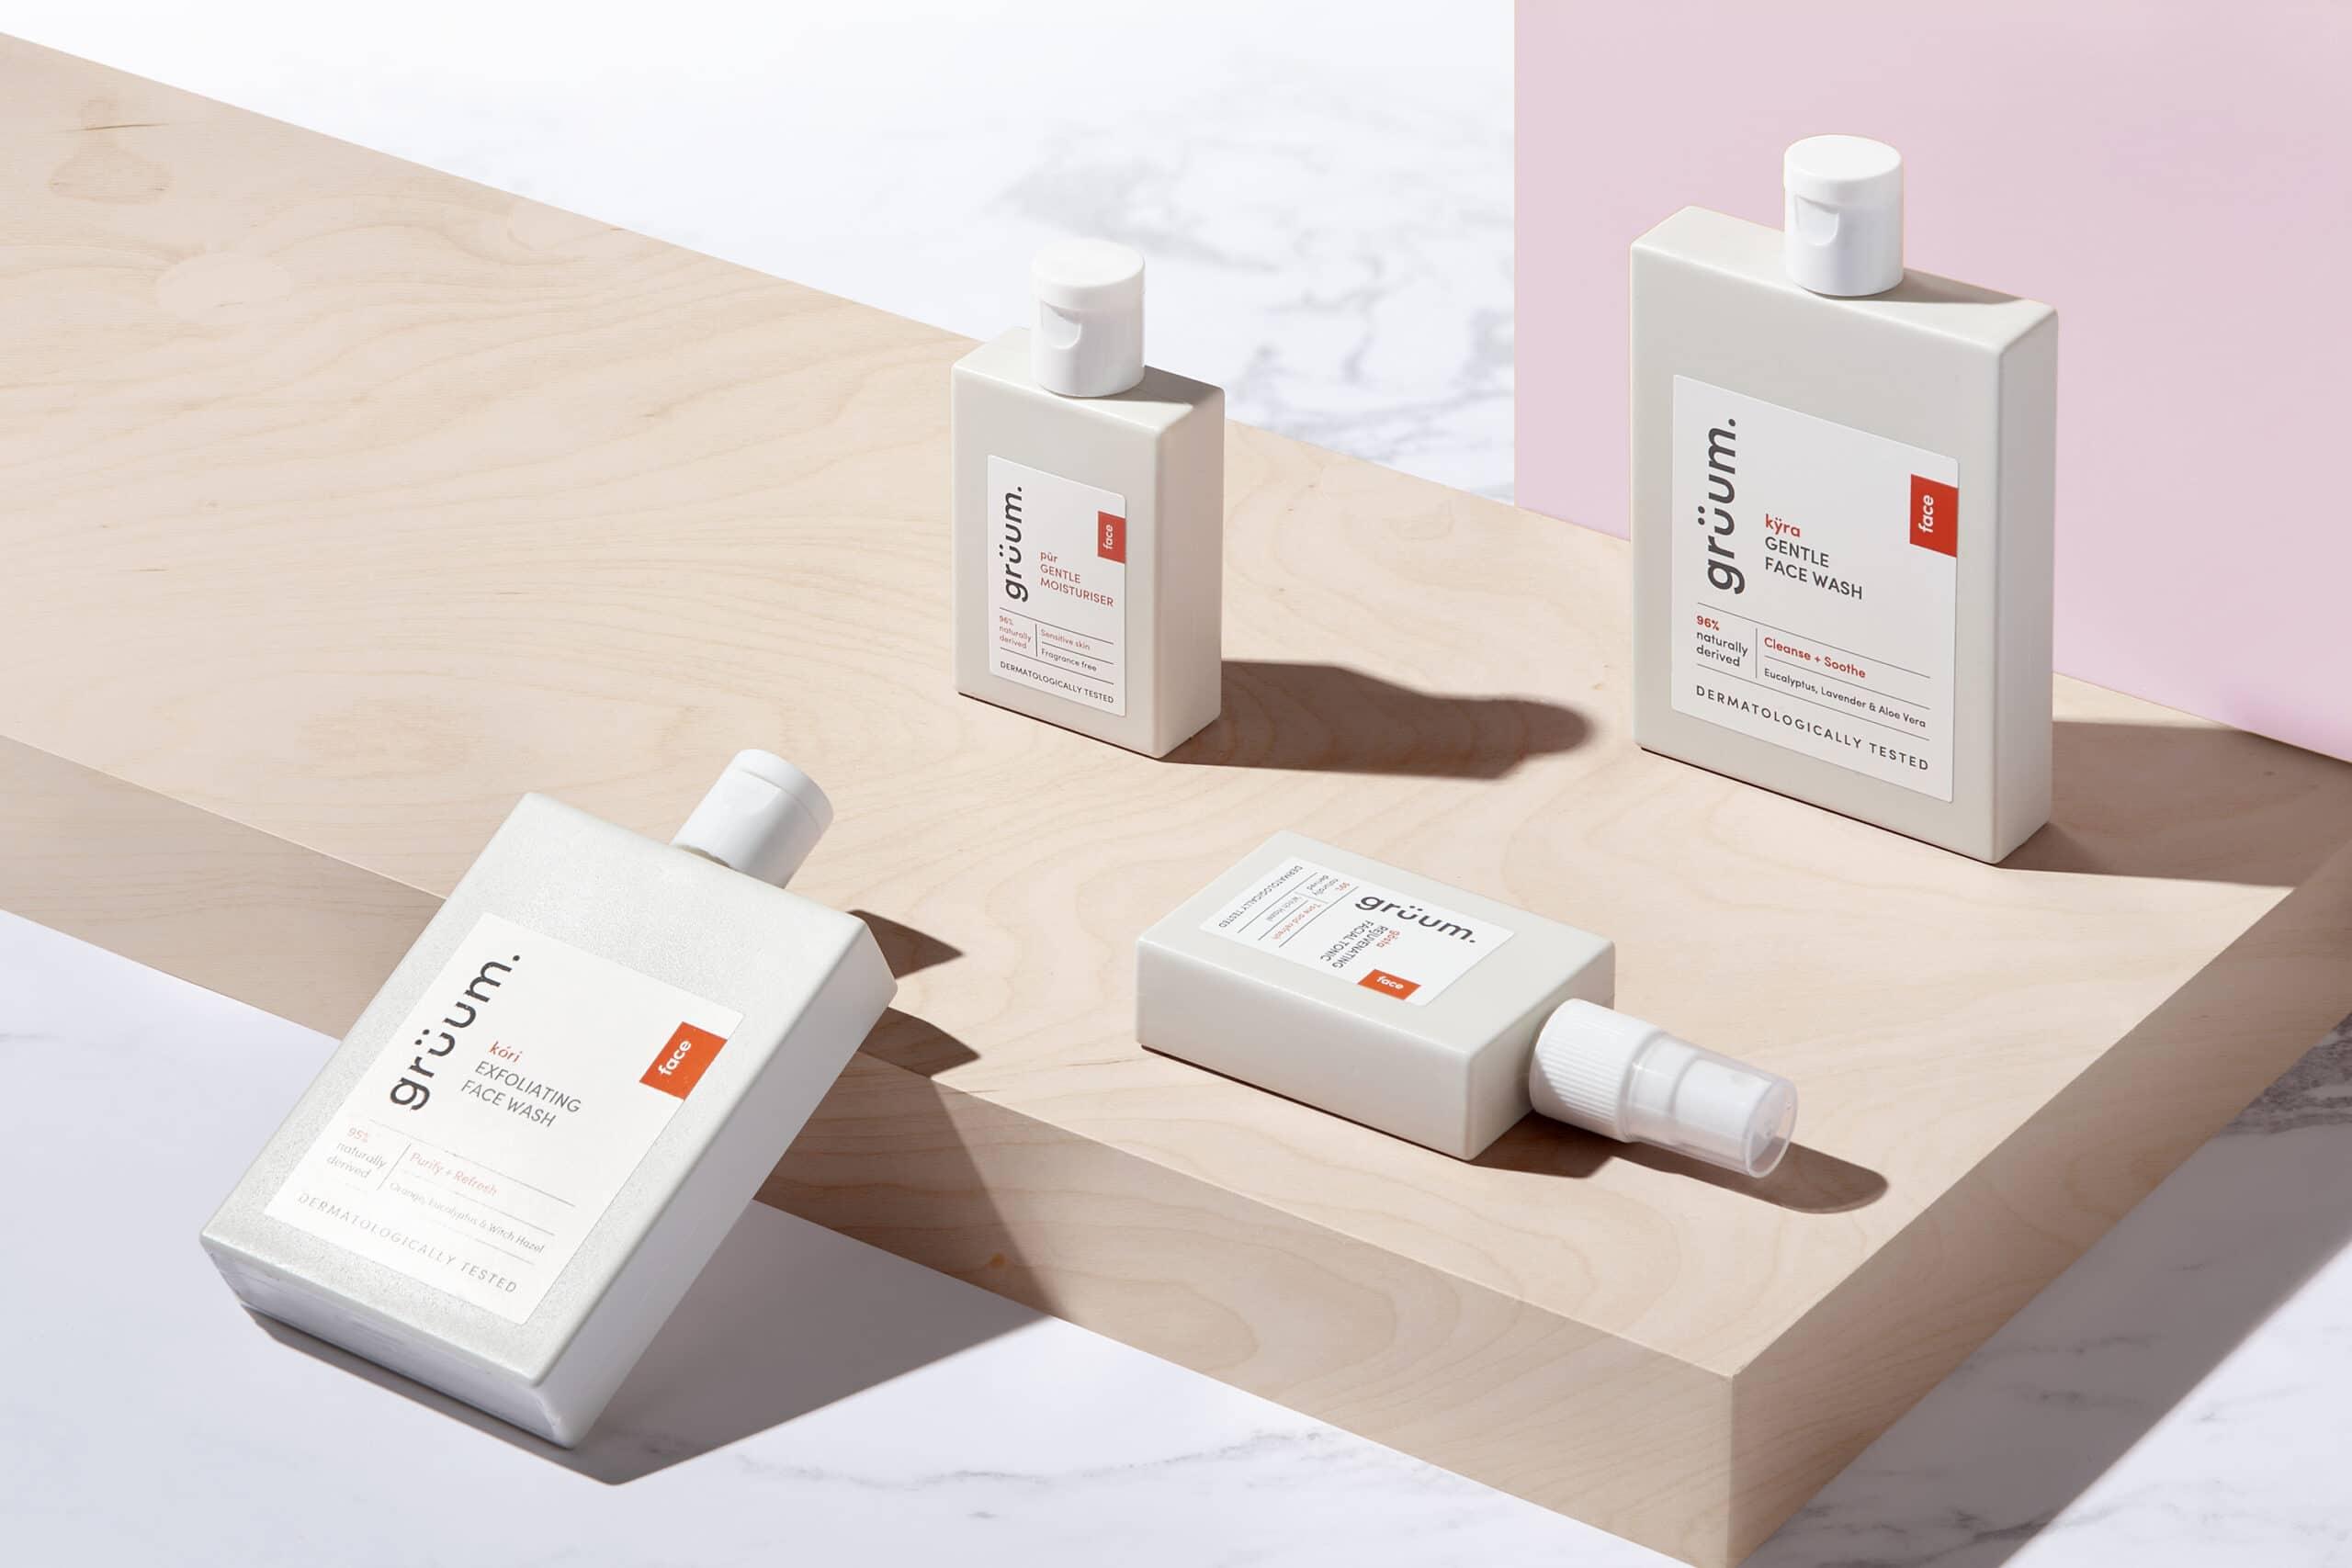 Gruum skincare squad gift set product image with kyra face wash, kori exfoliator face wash, pur gentle moisturiser and gosta facial tonic